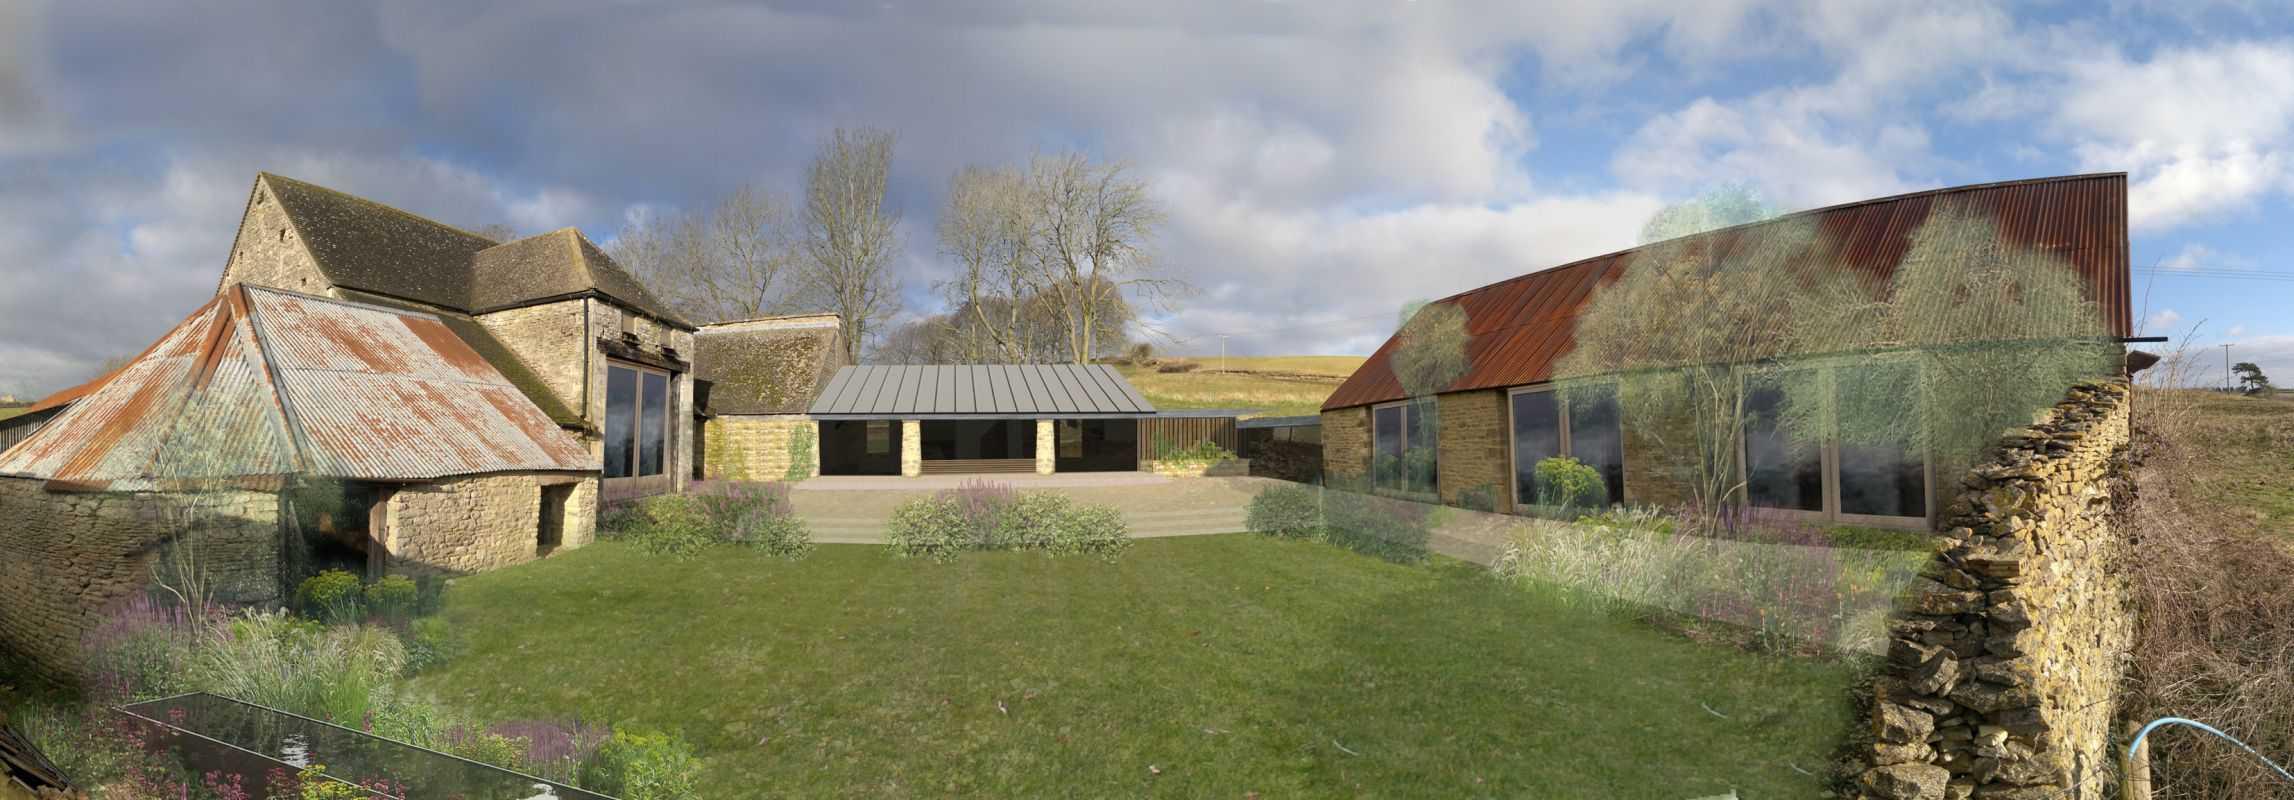 Contemporary Barn Conversion-Millar Howard Workshop-17-1 Kindesign